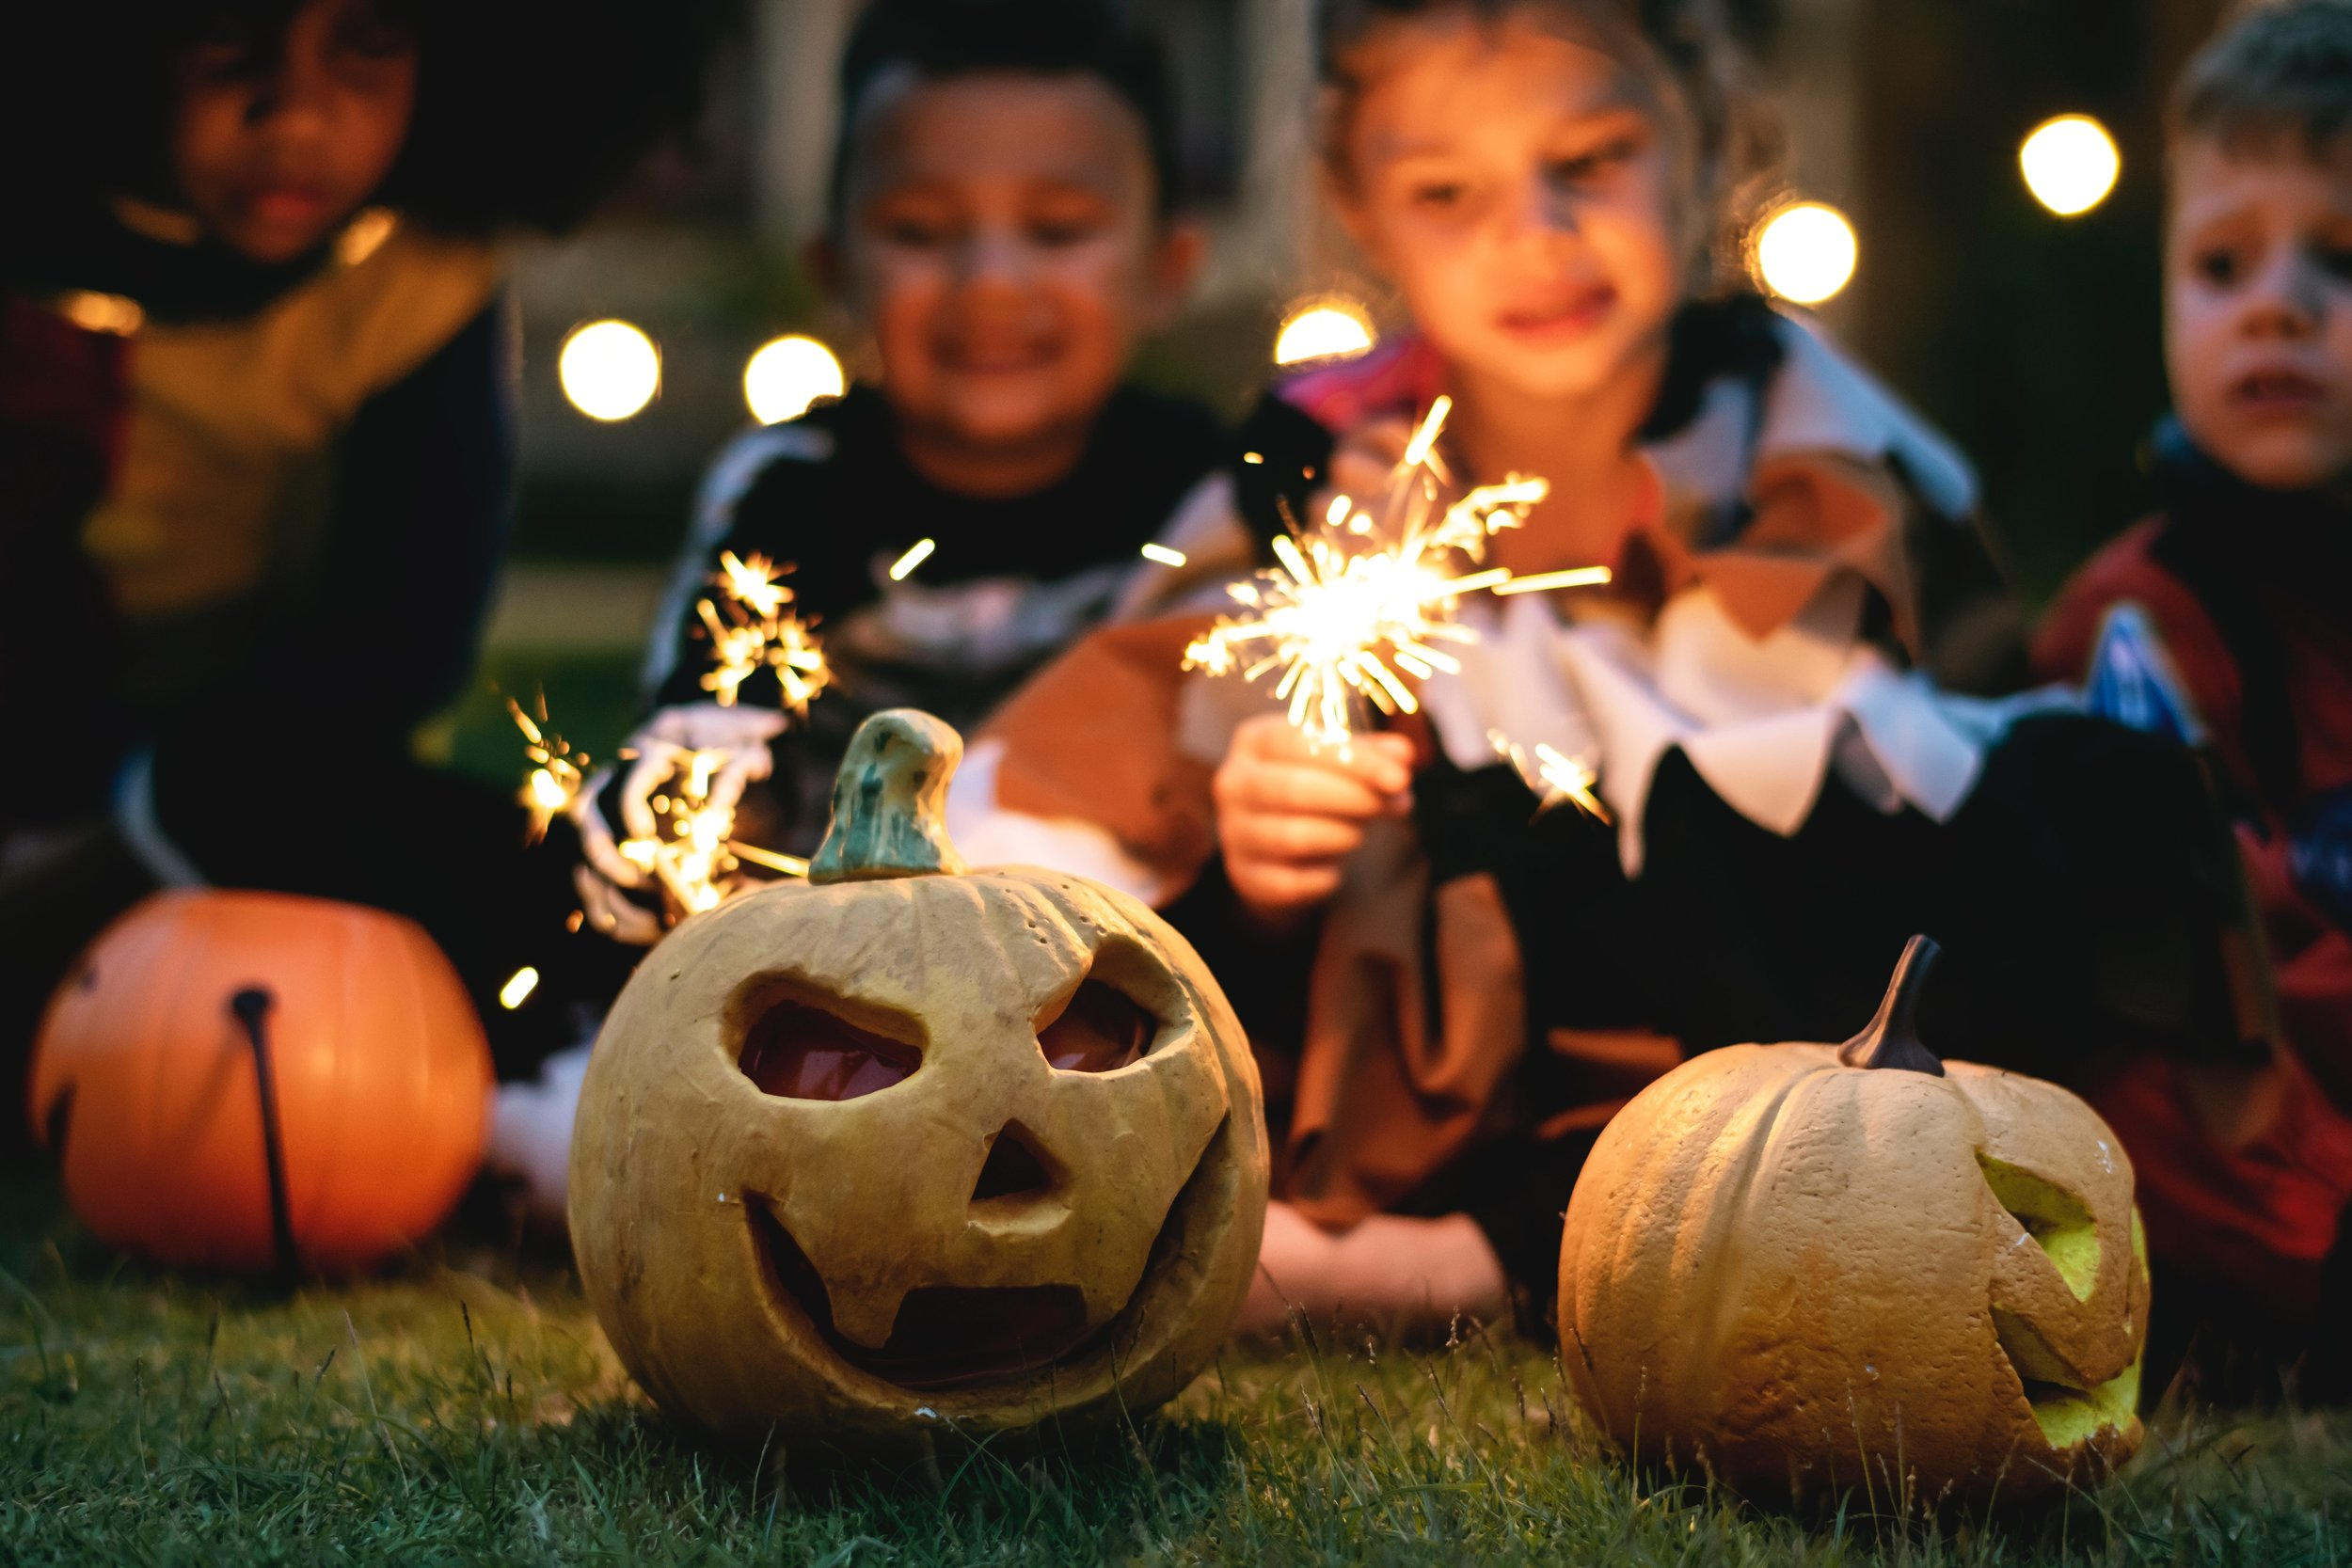 boys-carved-pumpkin-celebration-1371178 (1).jpg